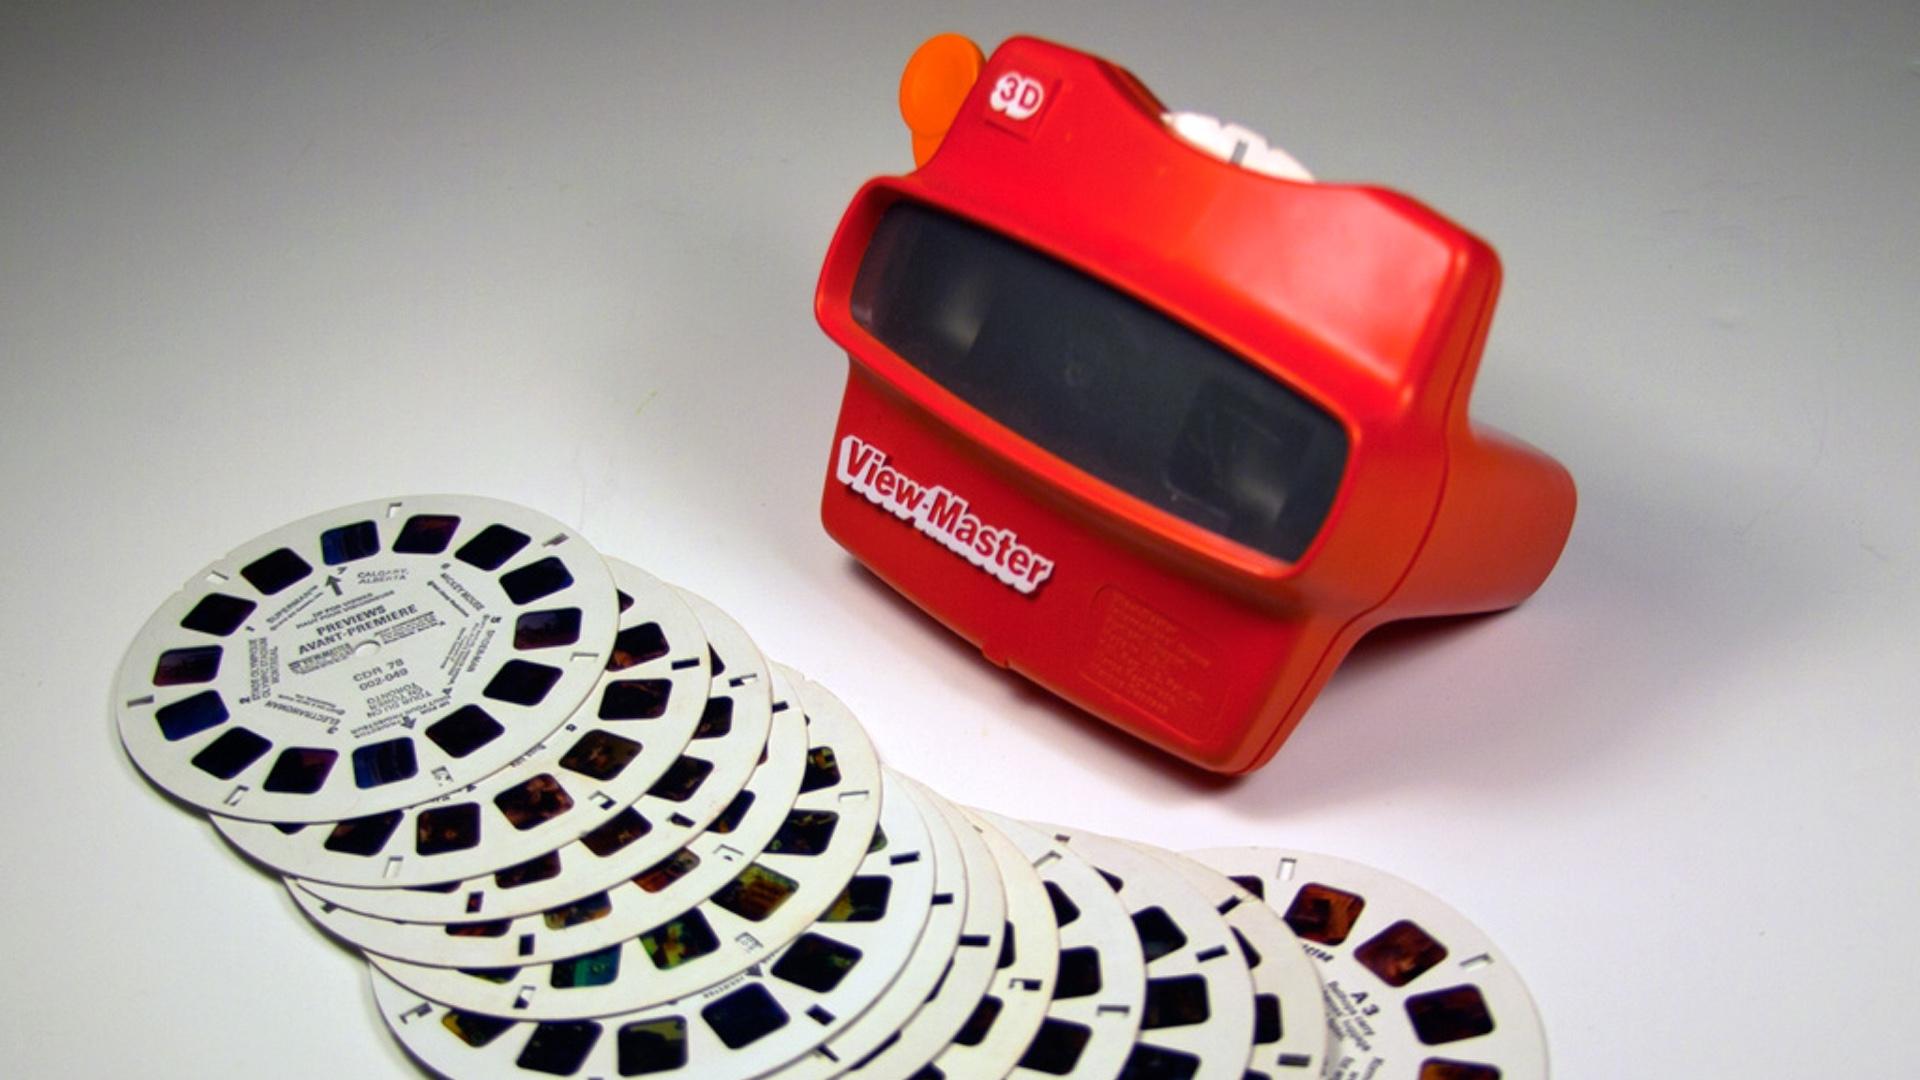 Mattel Viewmaster